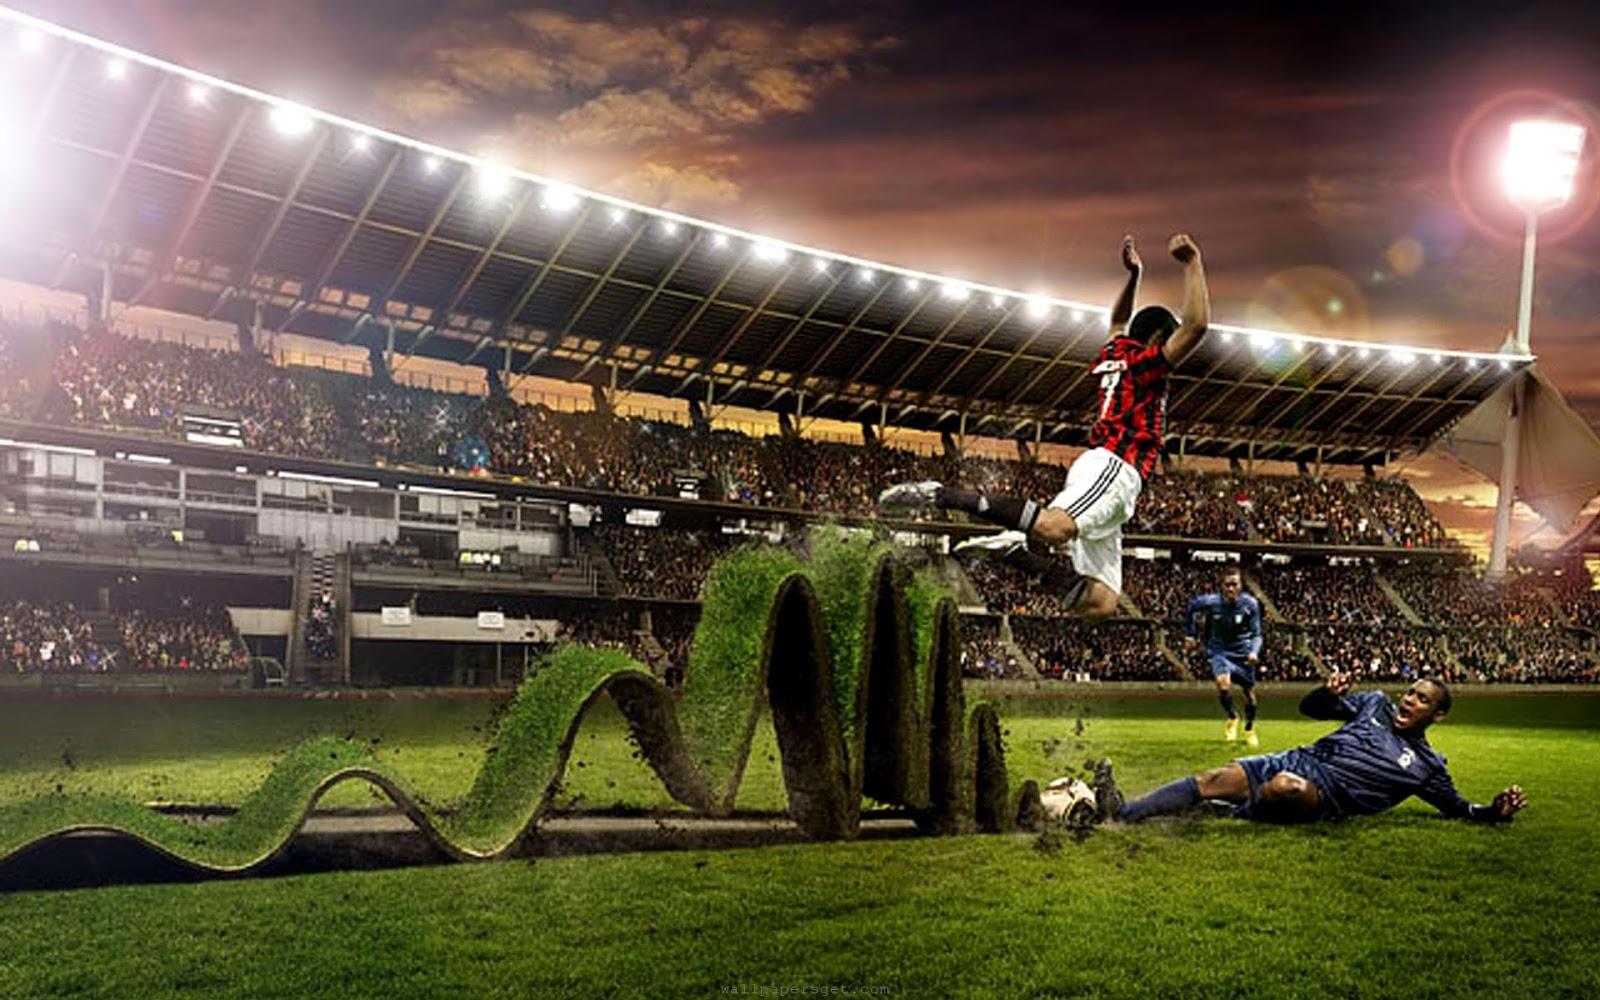 Football Hd Wallpapers: NEW FOOTBALL HD WALLPAPERS